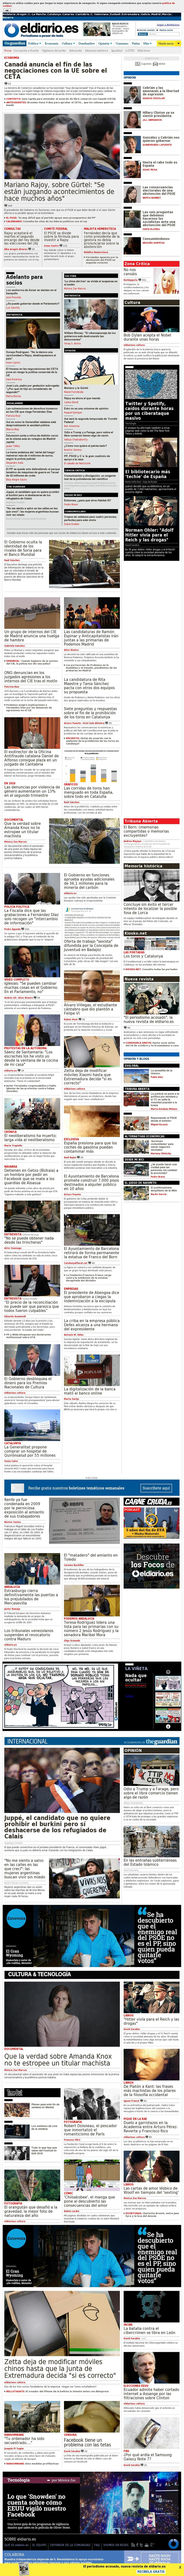 El Diario at Saturday Oct. 22, 2016, 5:03 a.m. UTC